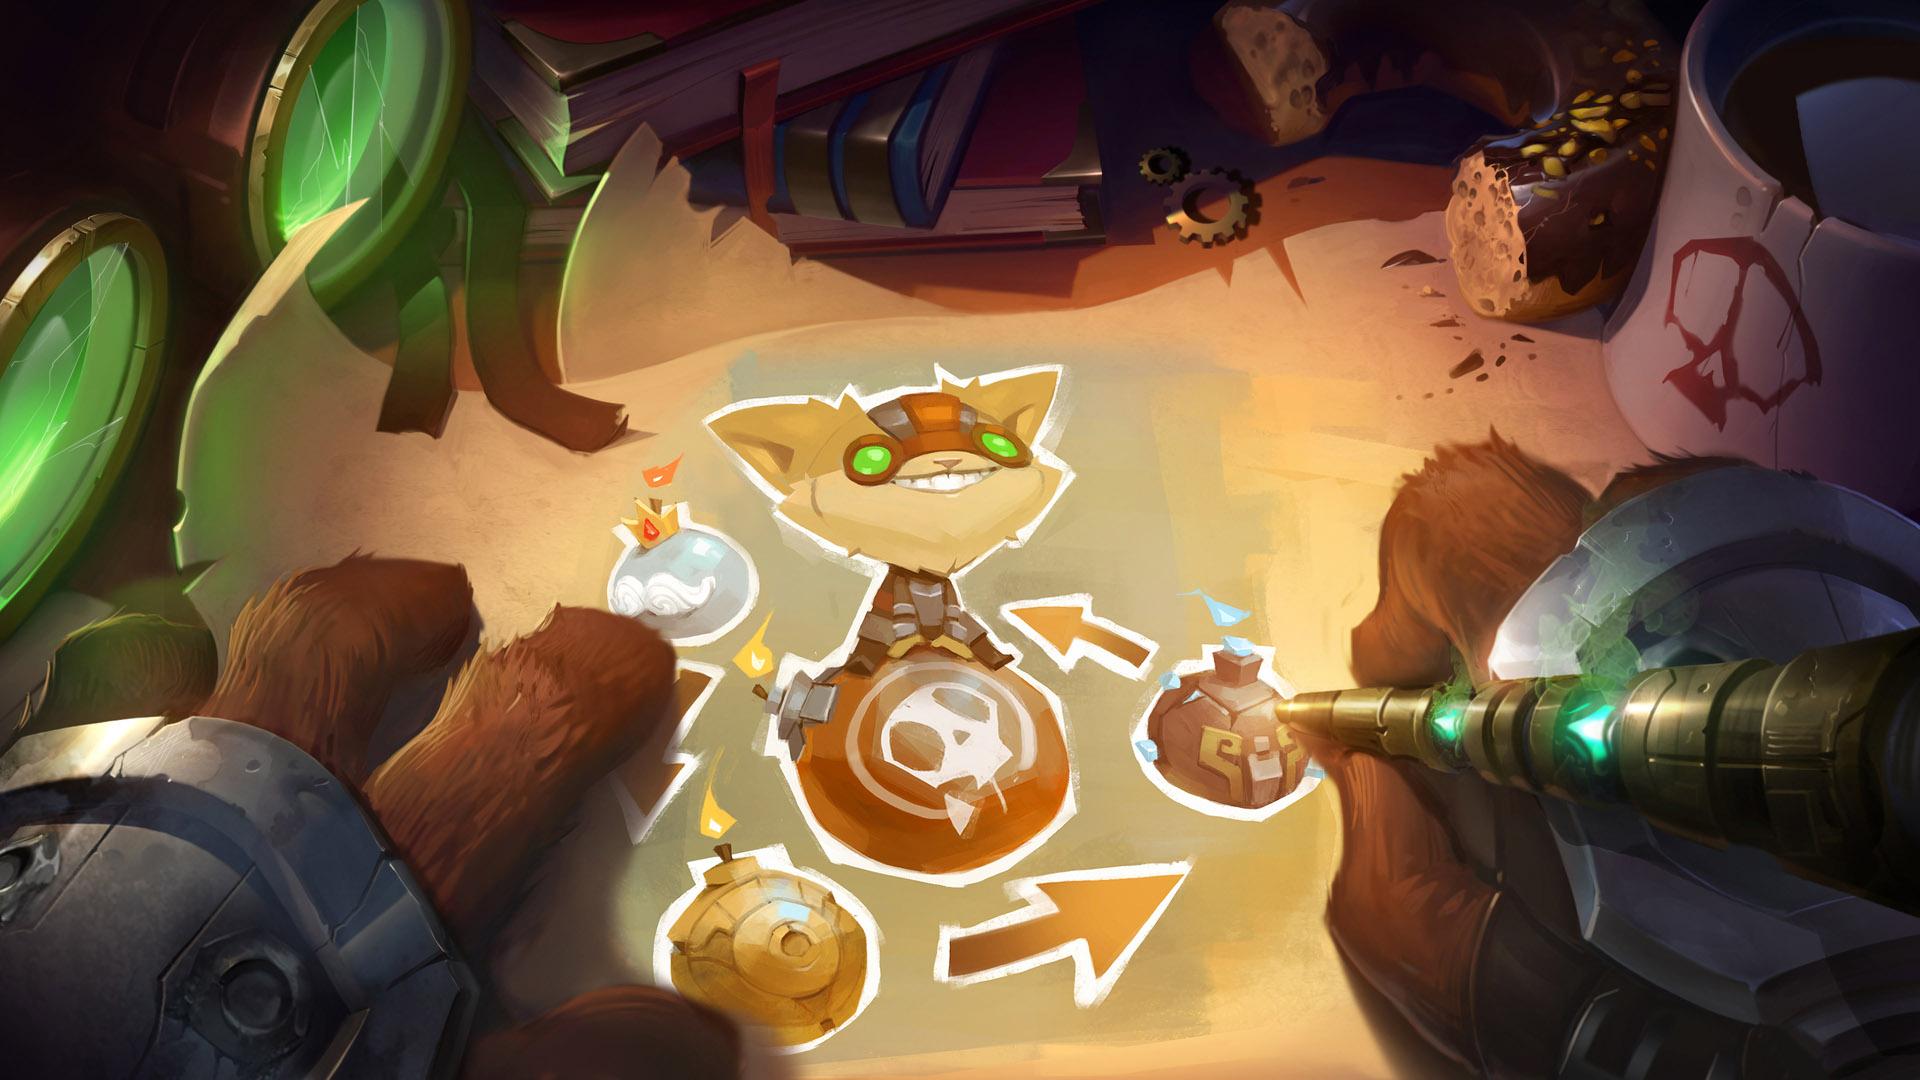 Teamfight Tactics Mobile Rilis Dalam Waktu Dekat Esportsku